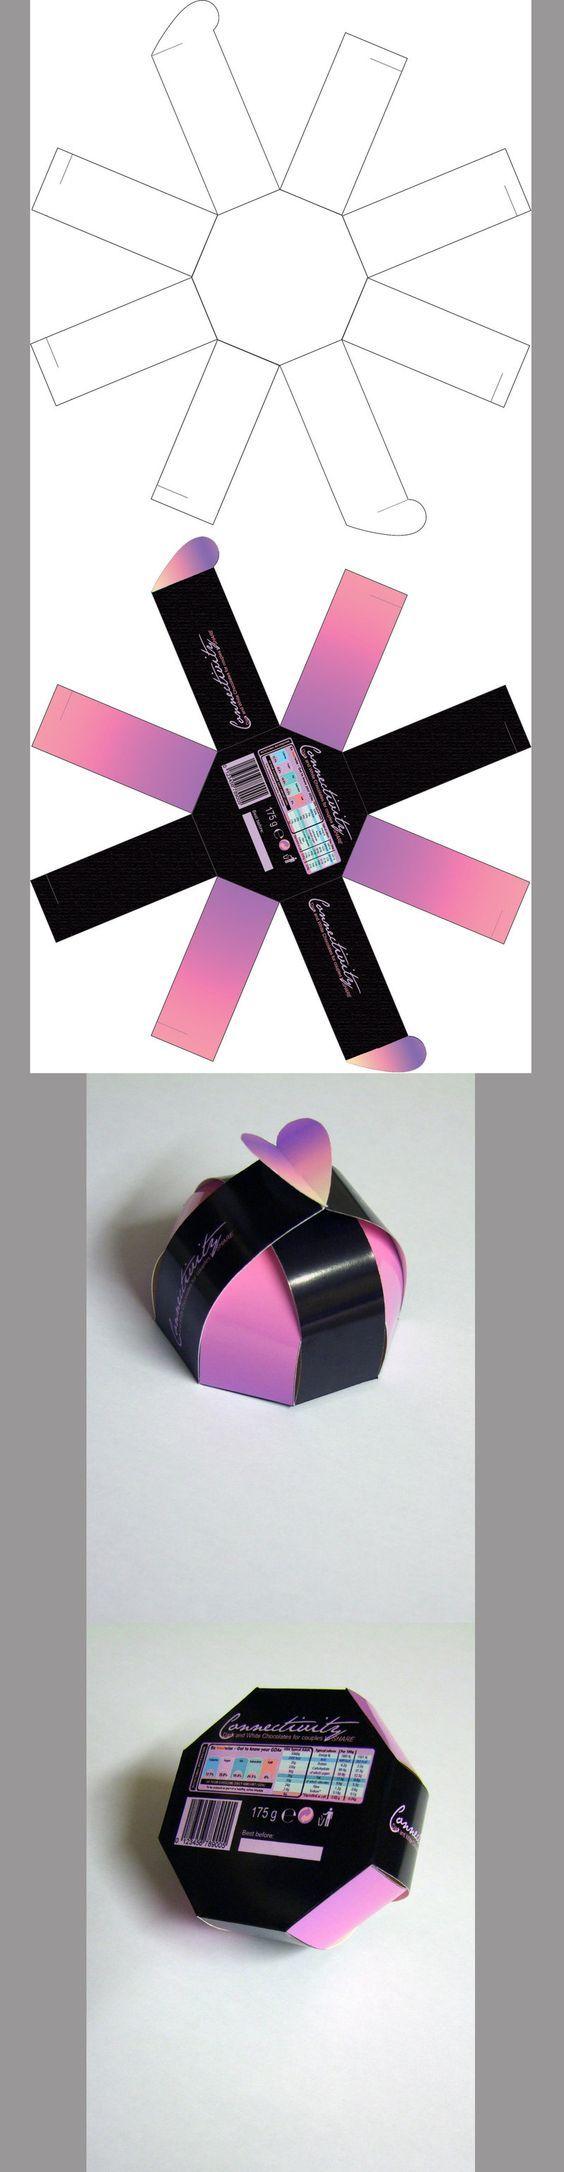 Chocolate Packaging - David Yates PD: